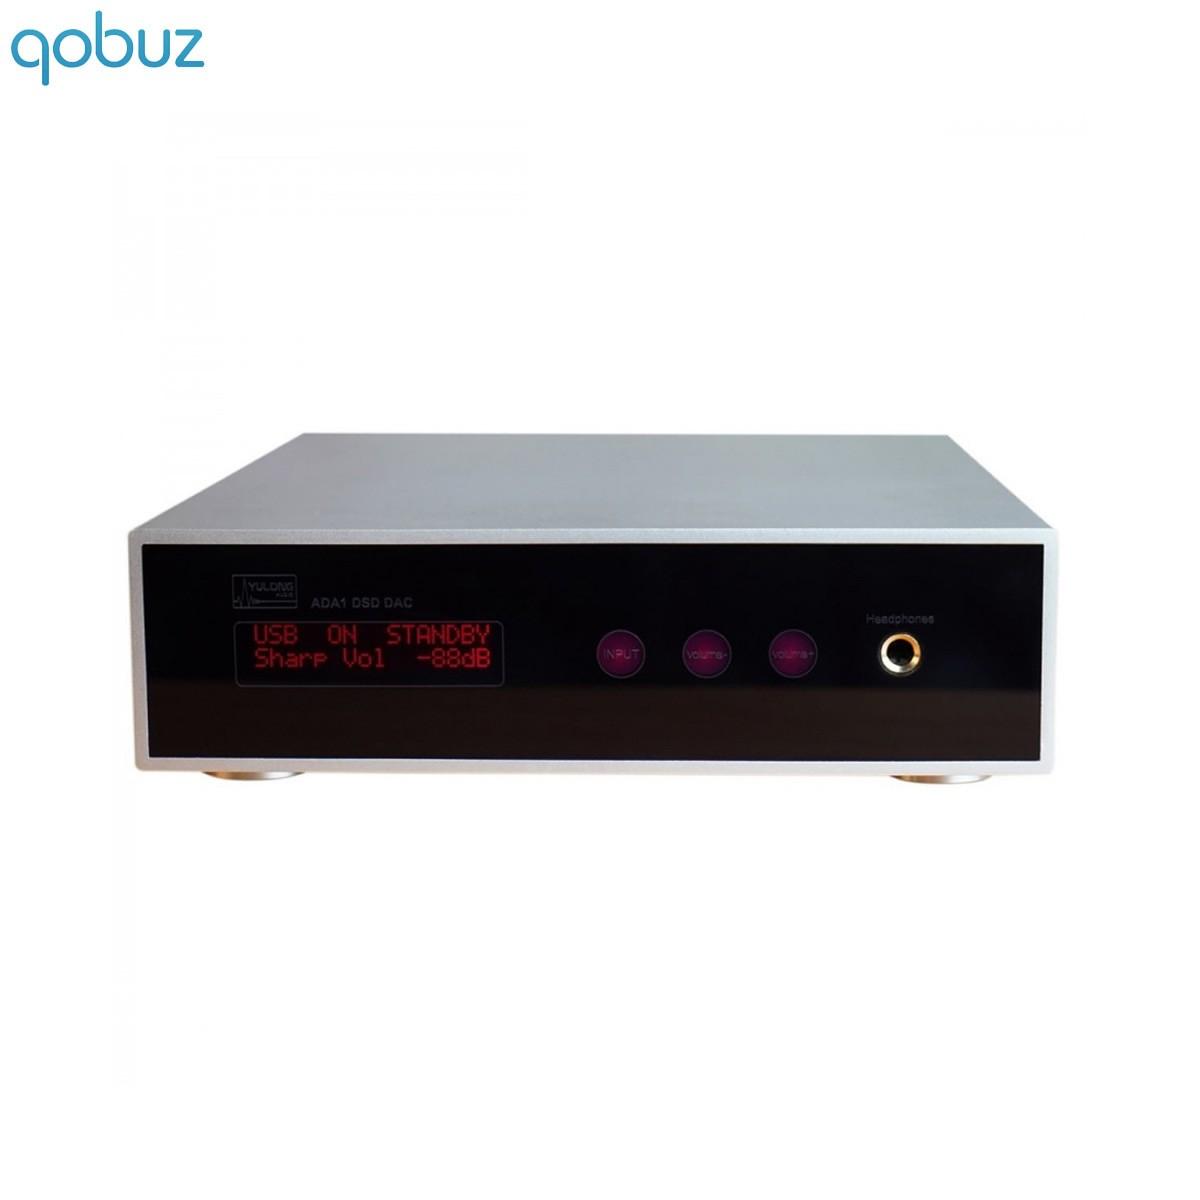 YULONG AUDIO ADA1 DAC USB ampli casque DSD 32bit 384Khz